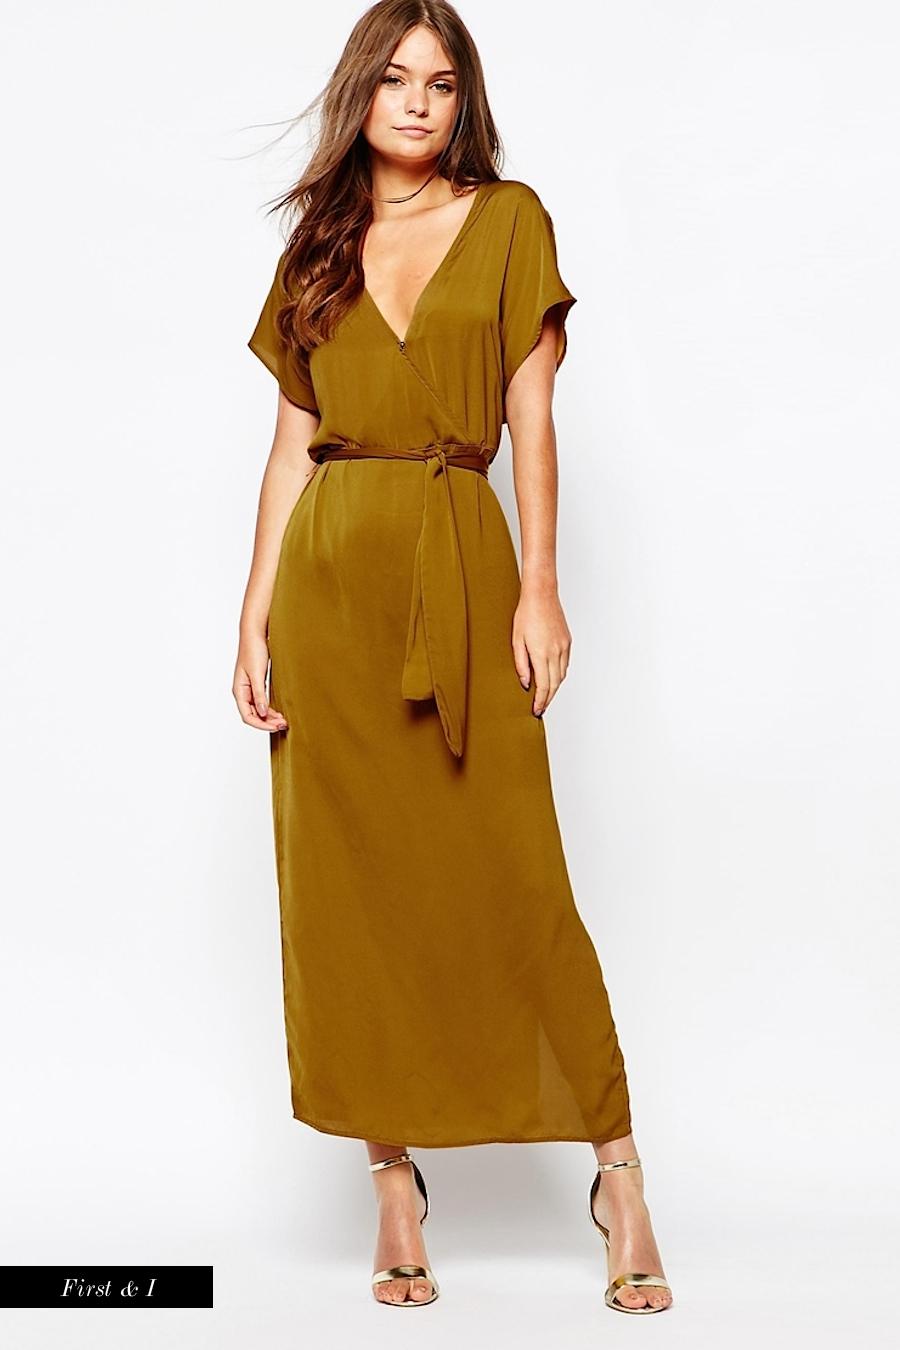 Maxi dress under 200 fash-n-chips.com 11